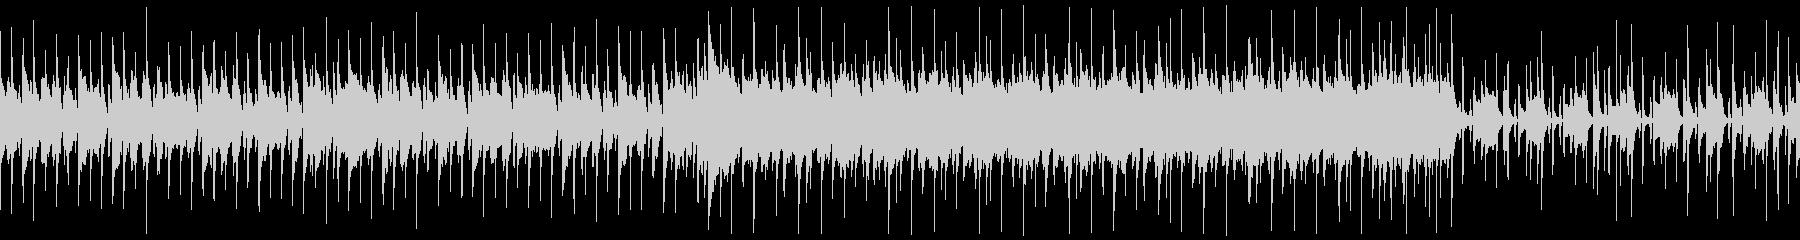 CM用8、楽しい口笛&ウクレレ・ロックCの未再生の波形